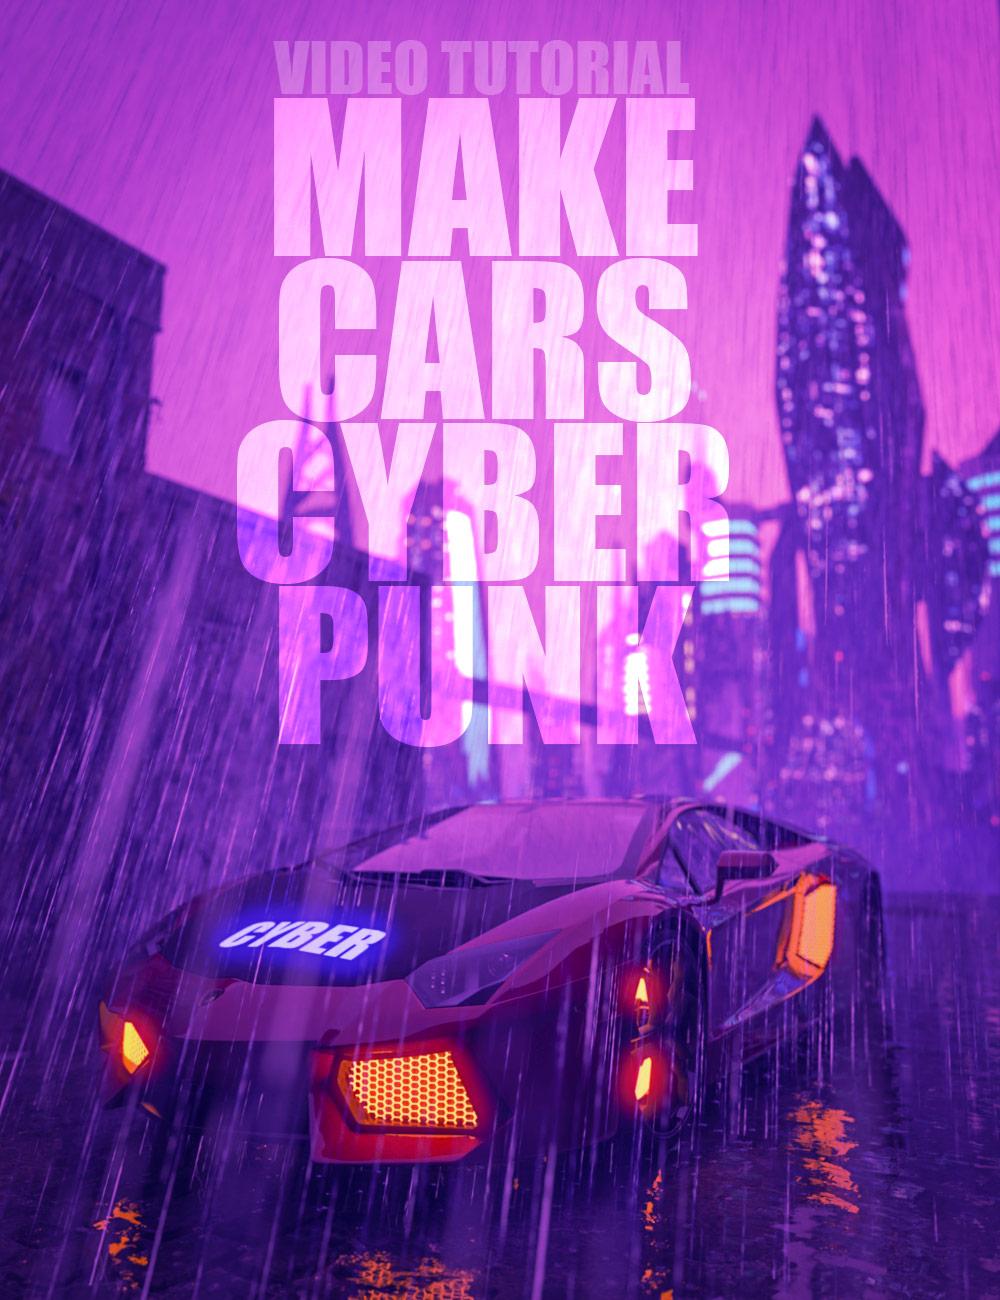 Make Cars Cyberpunk - Video Tutorial by: Dreamlight, 3D Models by Daz 3D